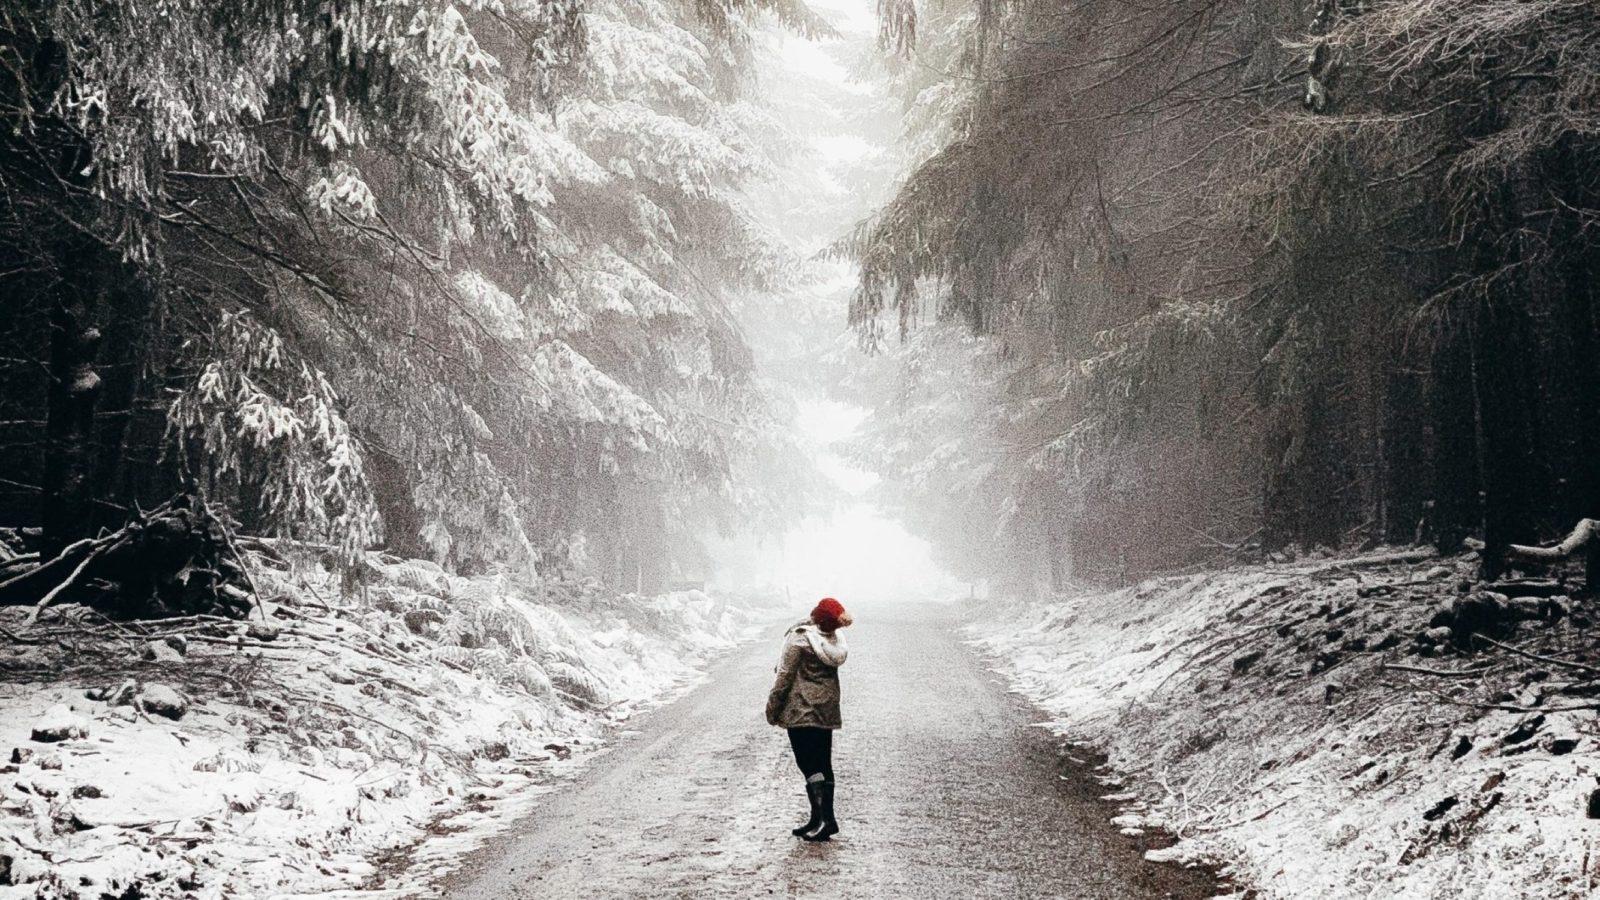 Barrington Tops Snow through the Firs